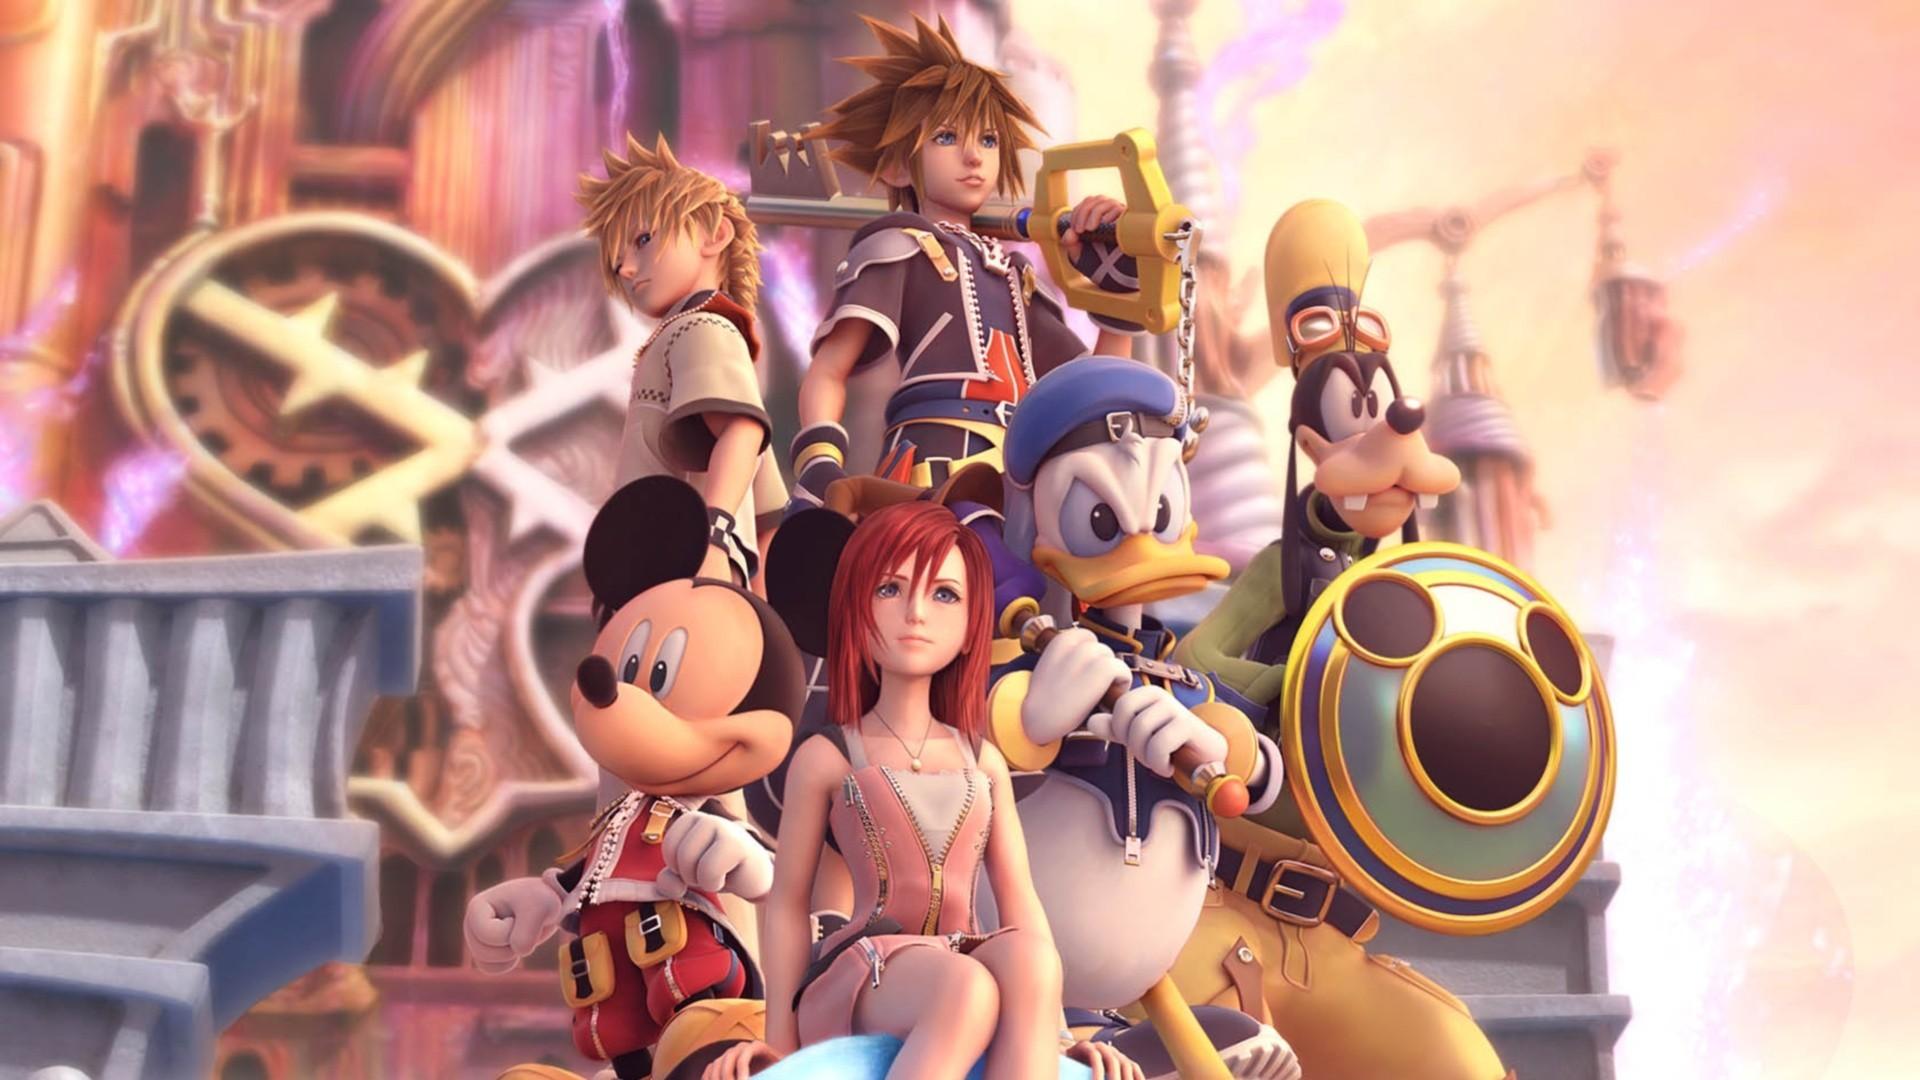 Kingdom Hearts wallpaper by TheKingdomHearts-FC on DeviantArt